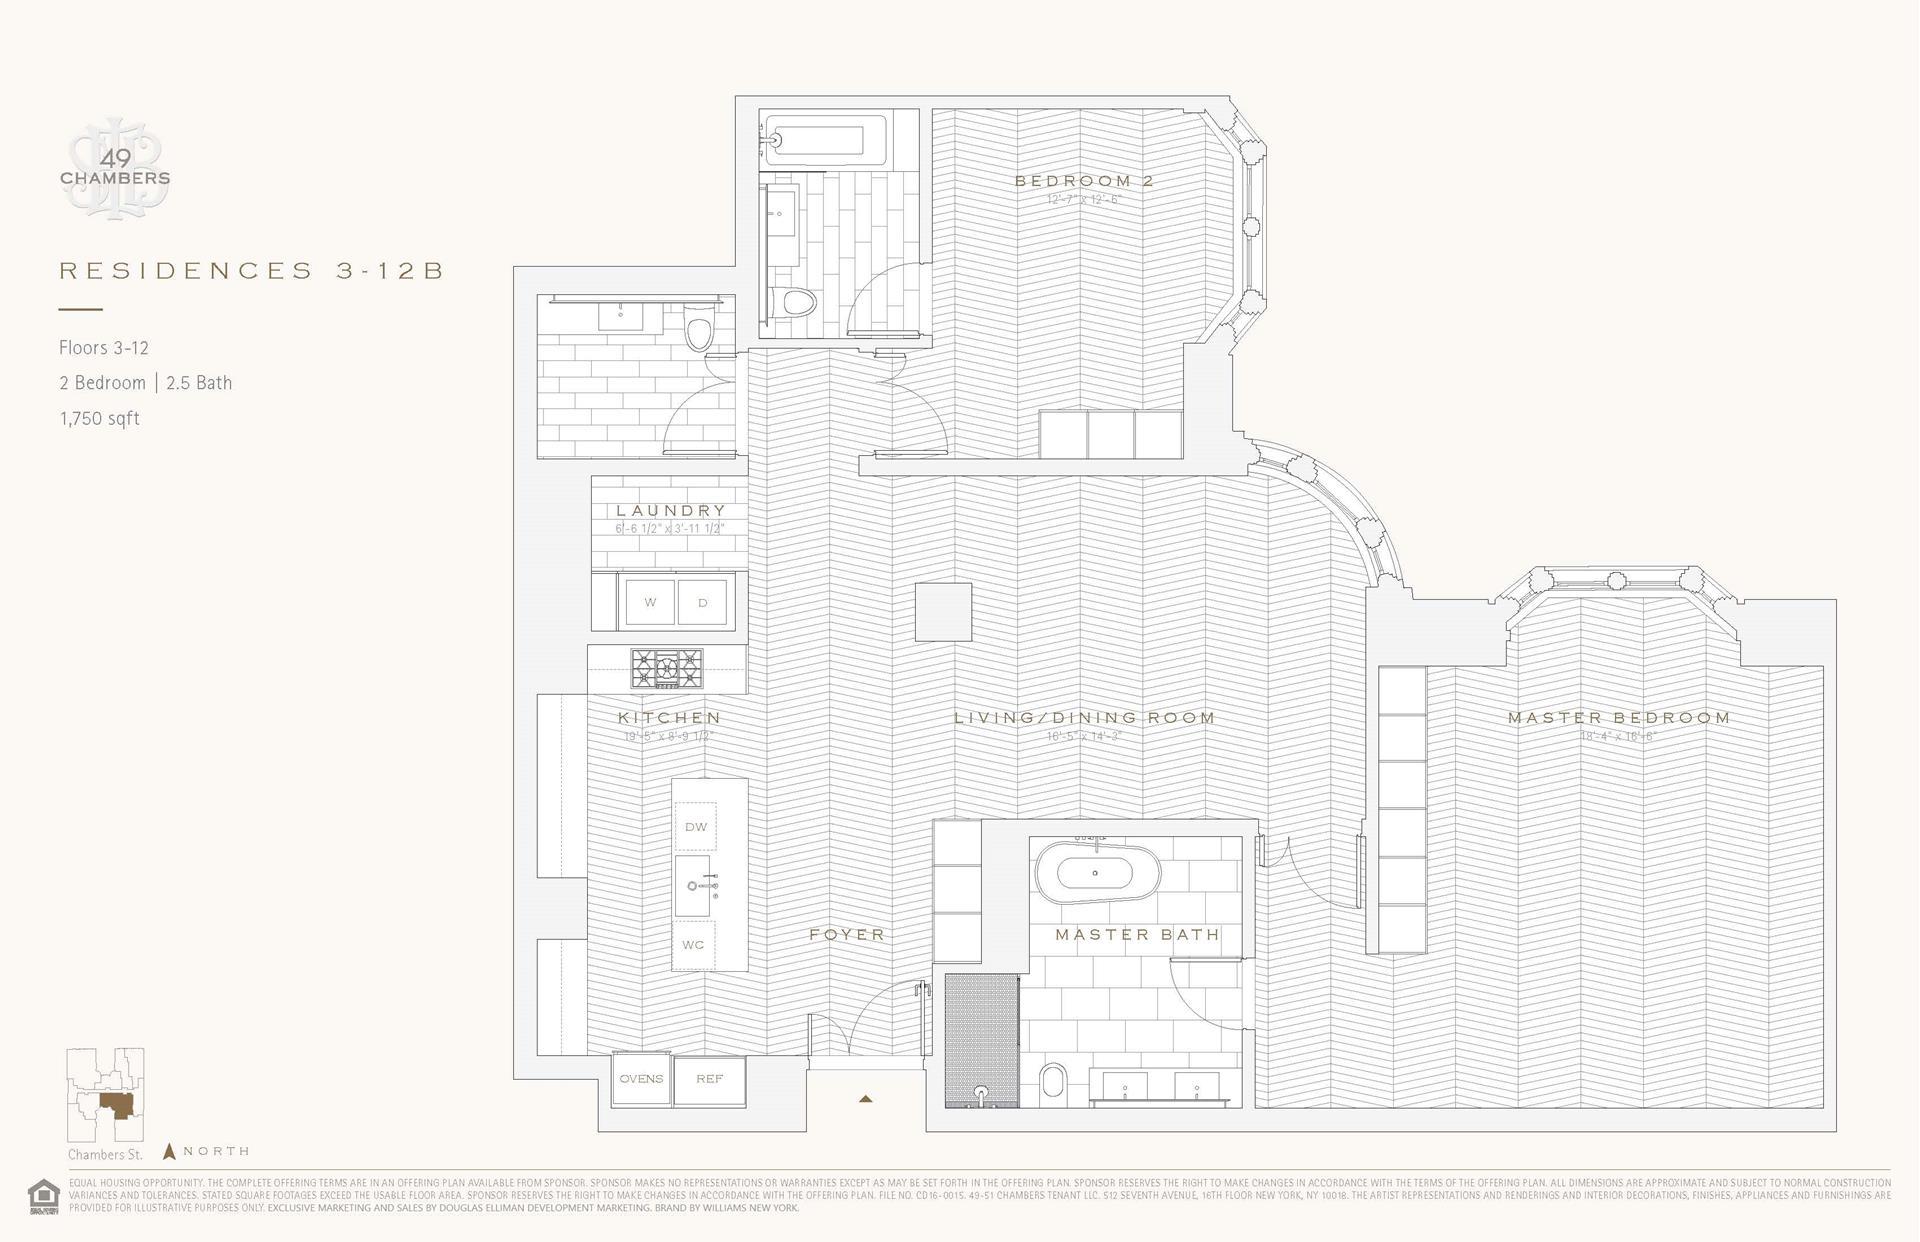 Floor plan of 49 Chambers St, 5B - TriBeCa, New York